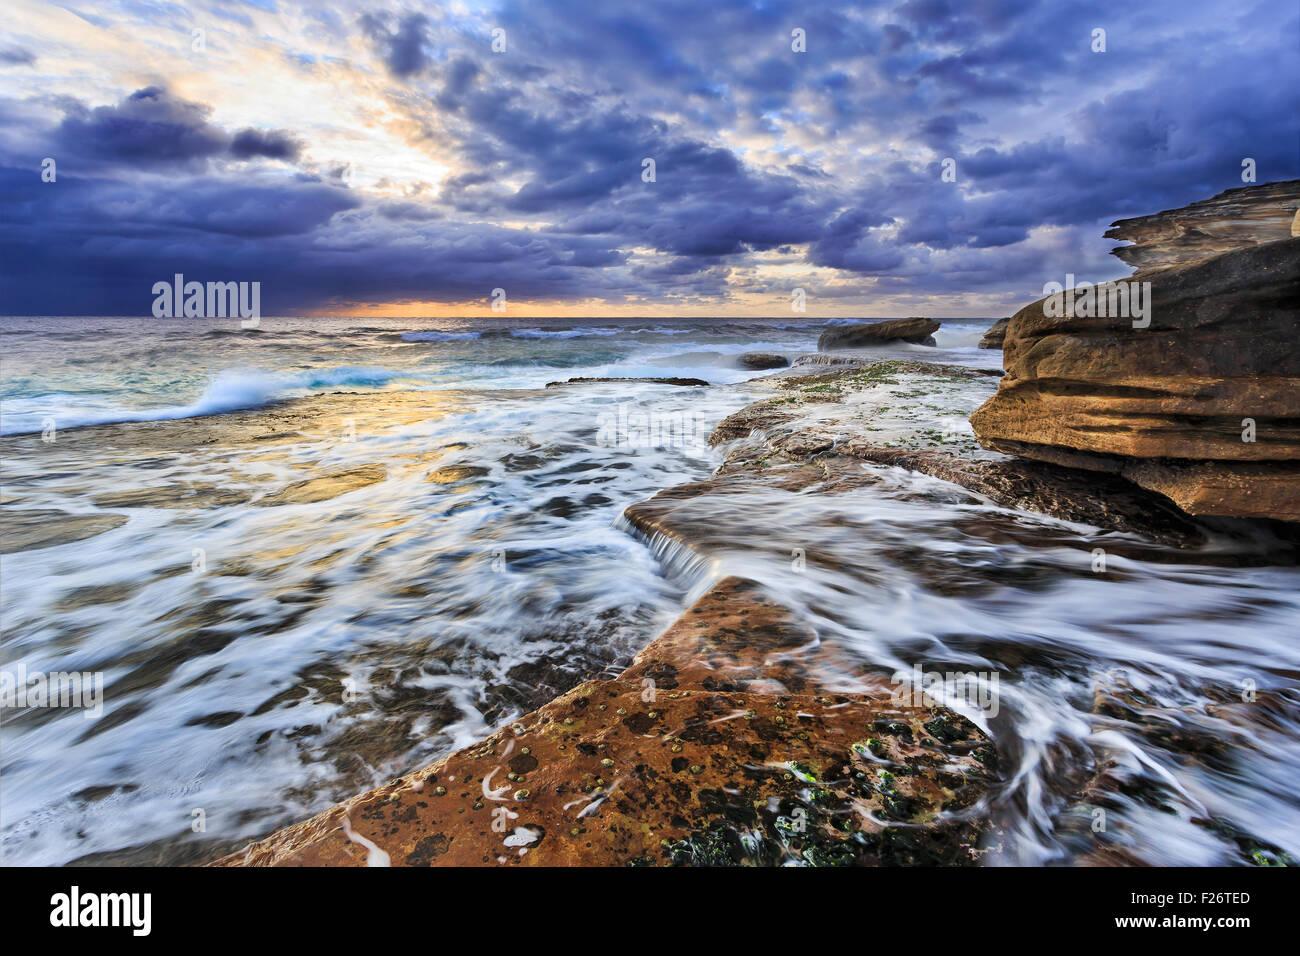 Picturesque pacific coastline at sunrise near Maroubra beach in Sydney - Stock Image